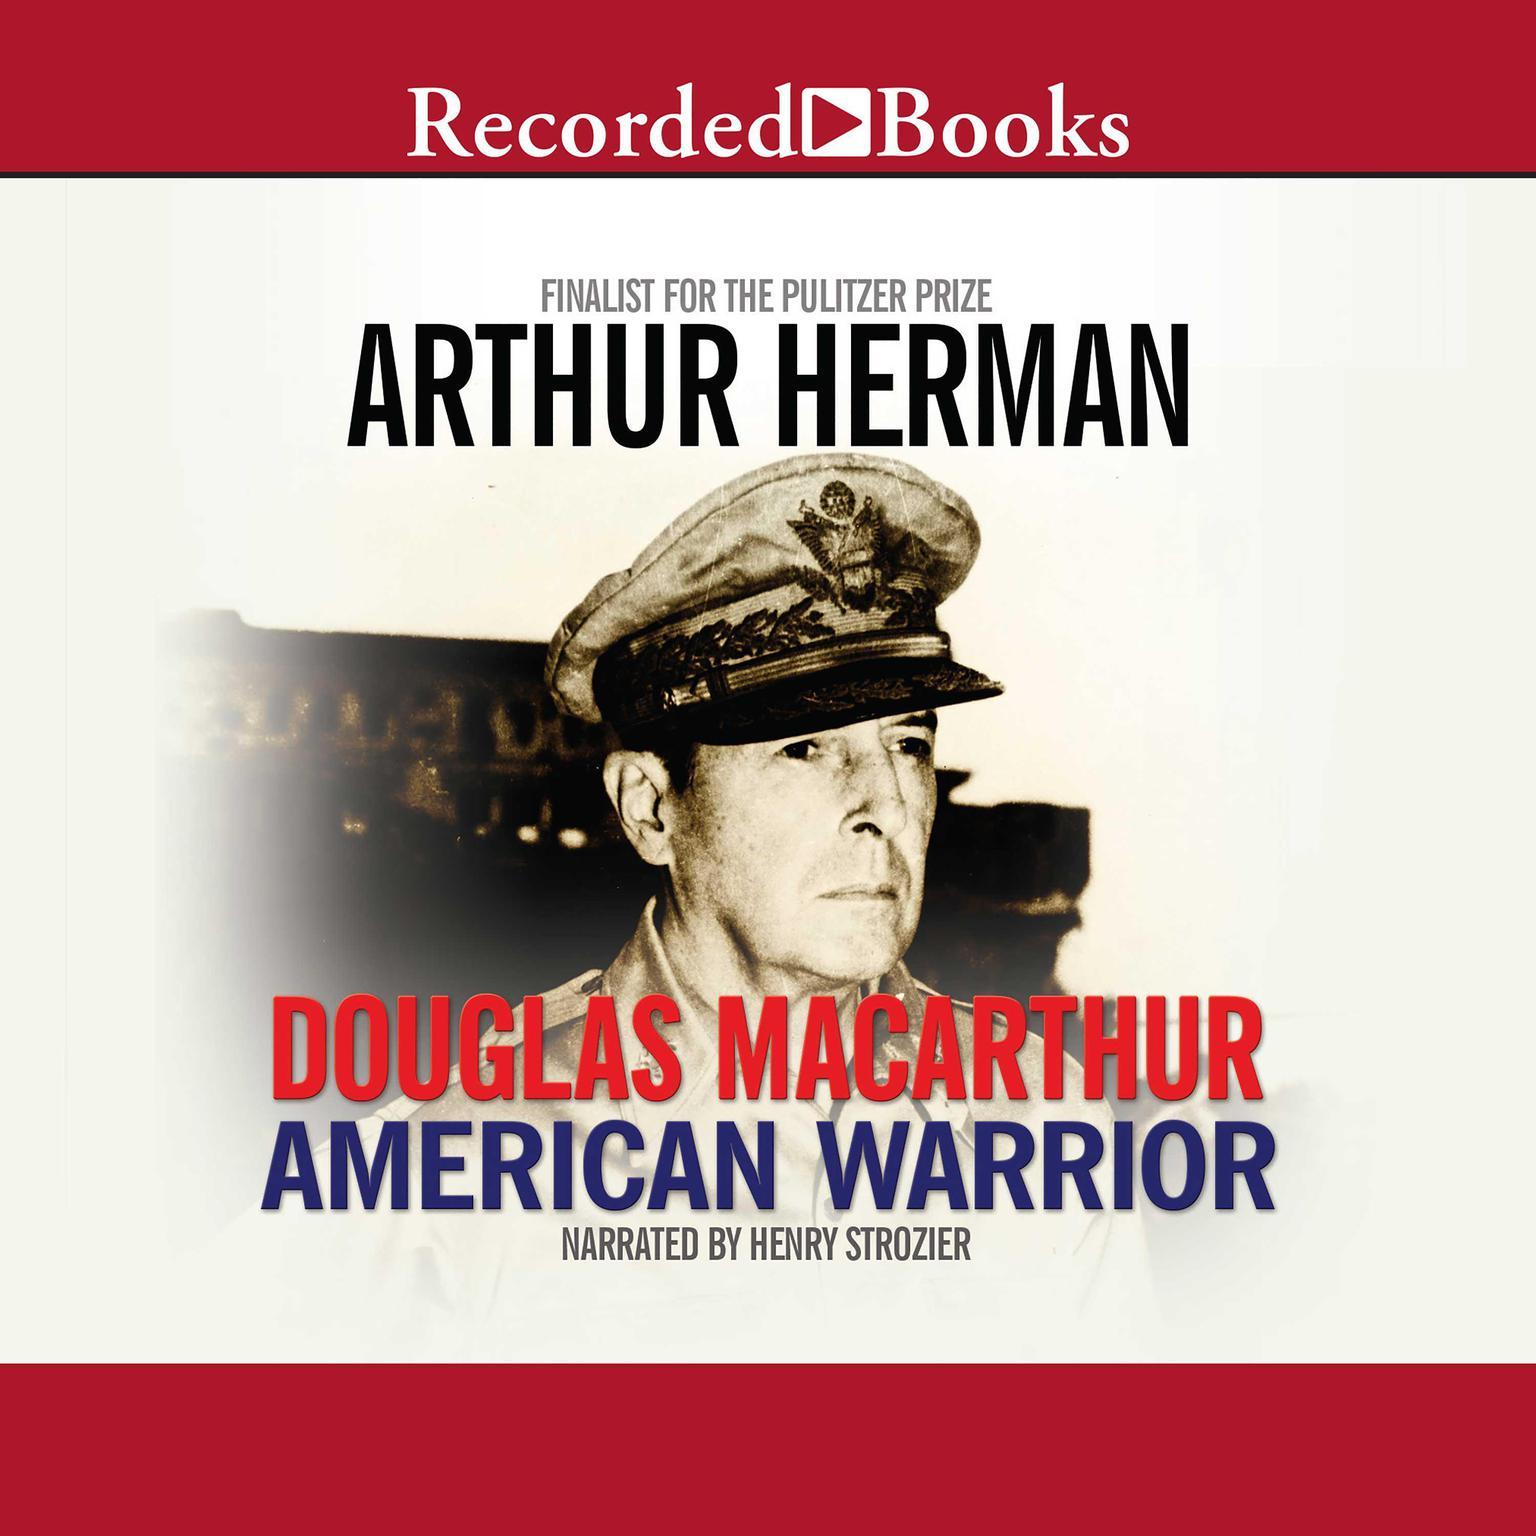 Douglas MacArthur: American Warrior Audiobook, by Arthur Herman